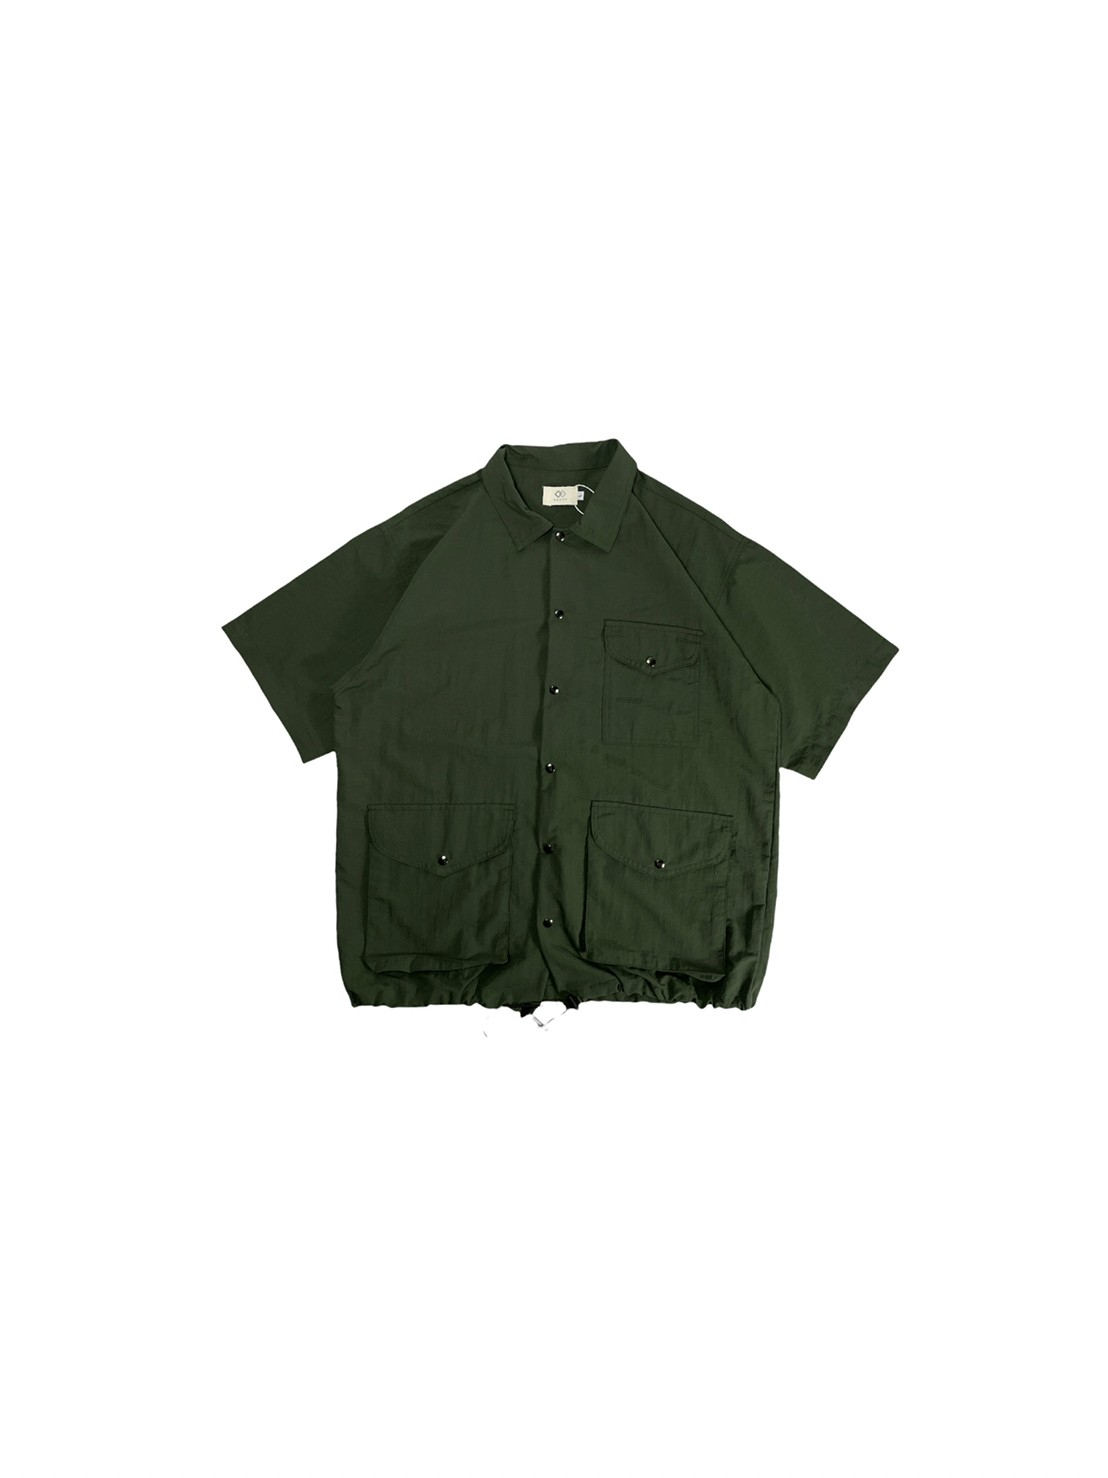 Camping Shirt Short Sleeve (Green)